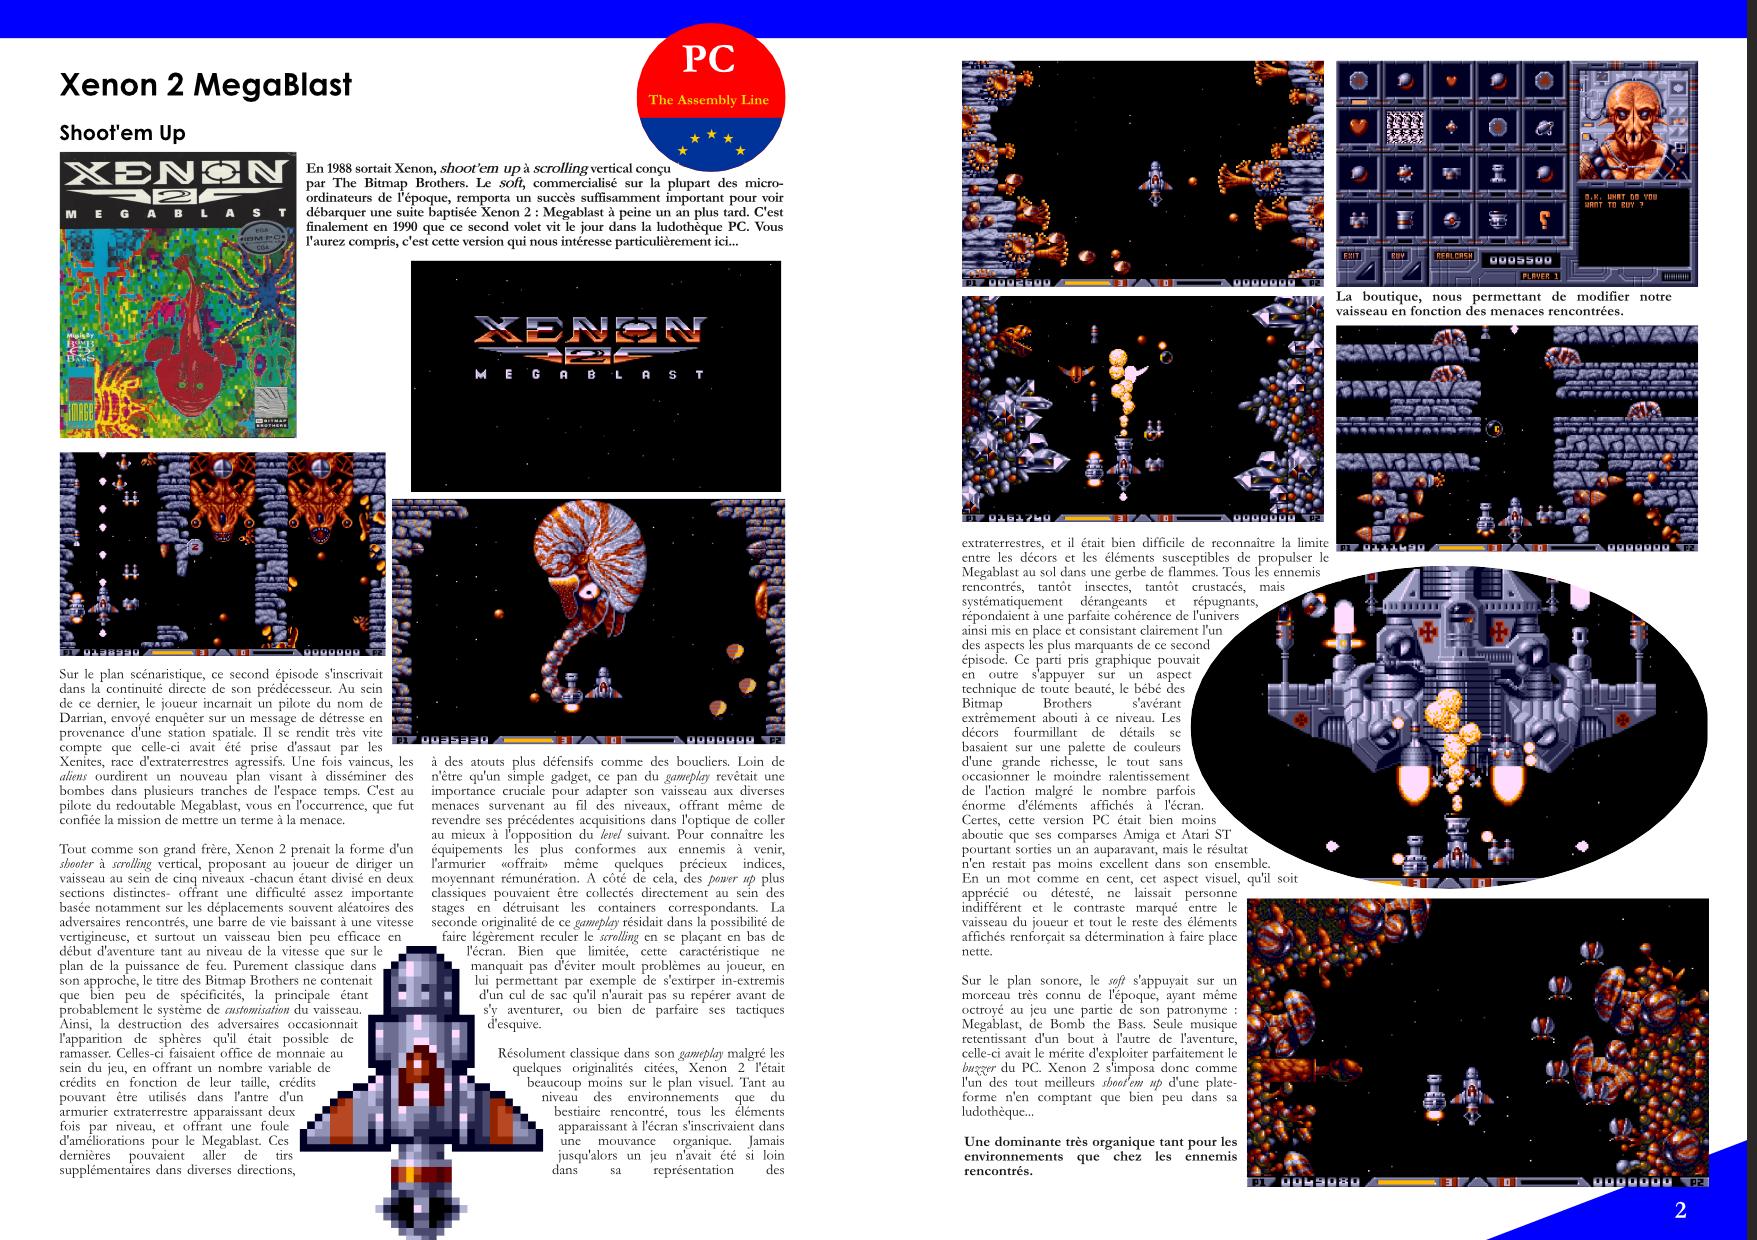 Flashback'90 extrait jeux micro - xenon 2 megablast PC